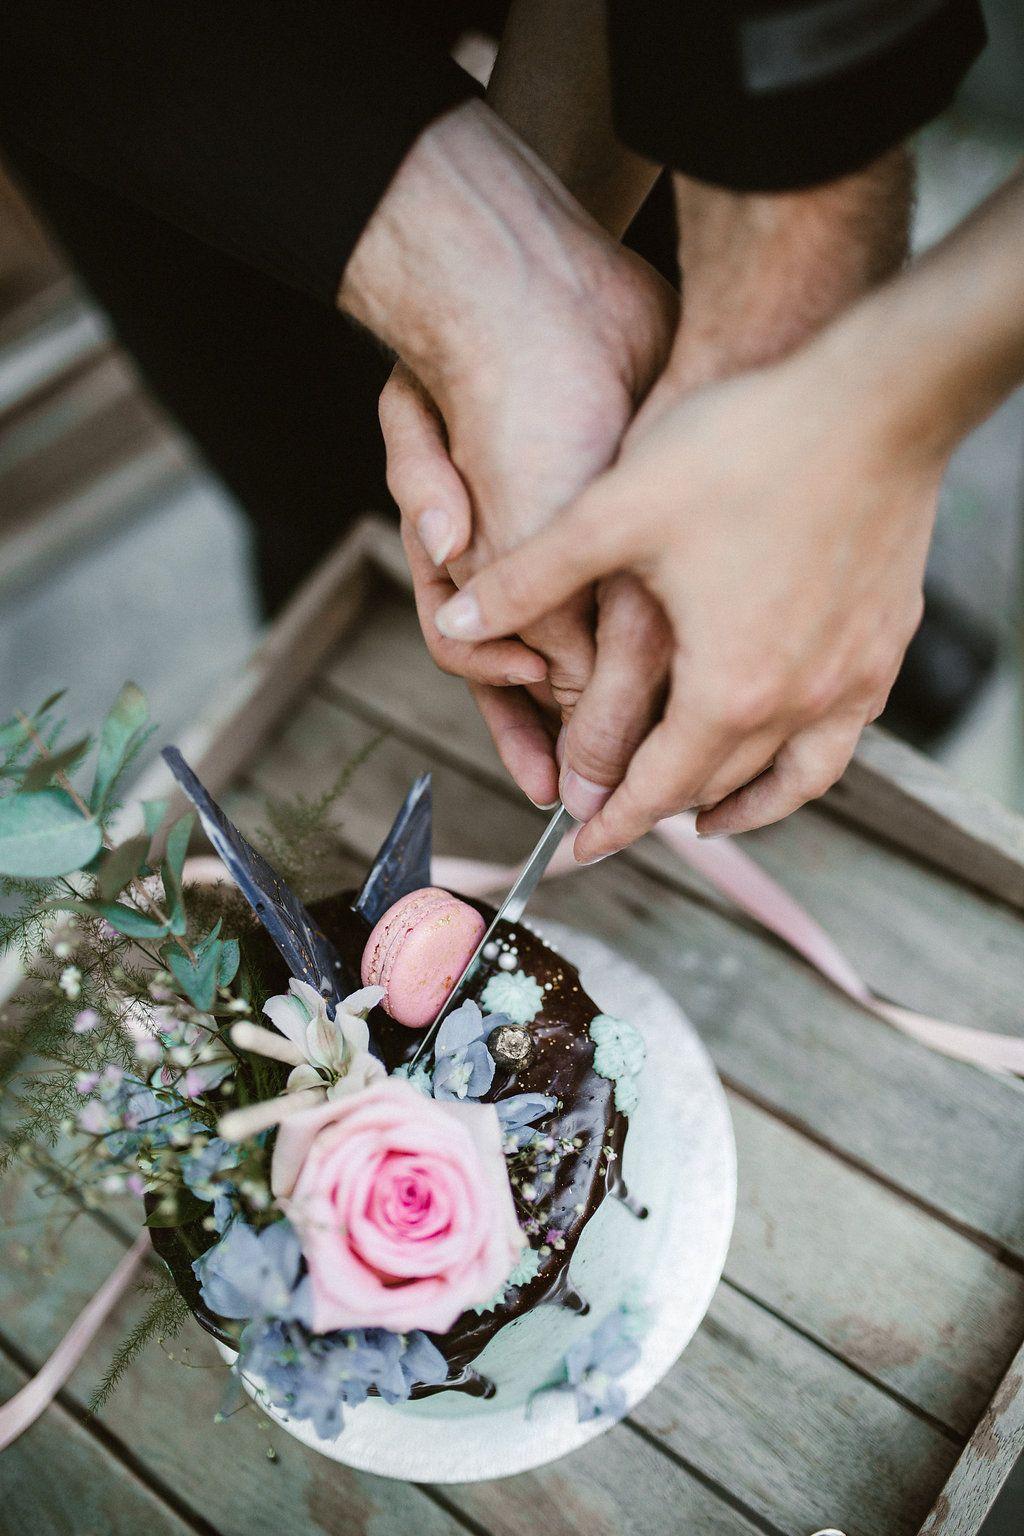 Wedding Styledshoot - Stylish bride & groom eating their wedding cake. So urban, modern and beautiful! More on WonderWed.de